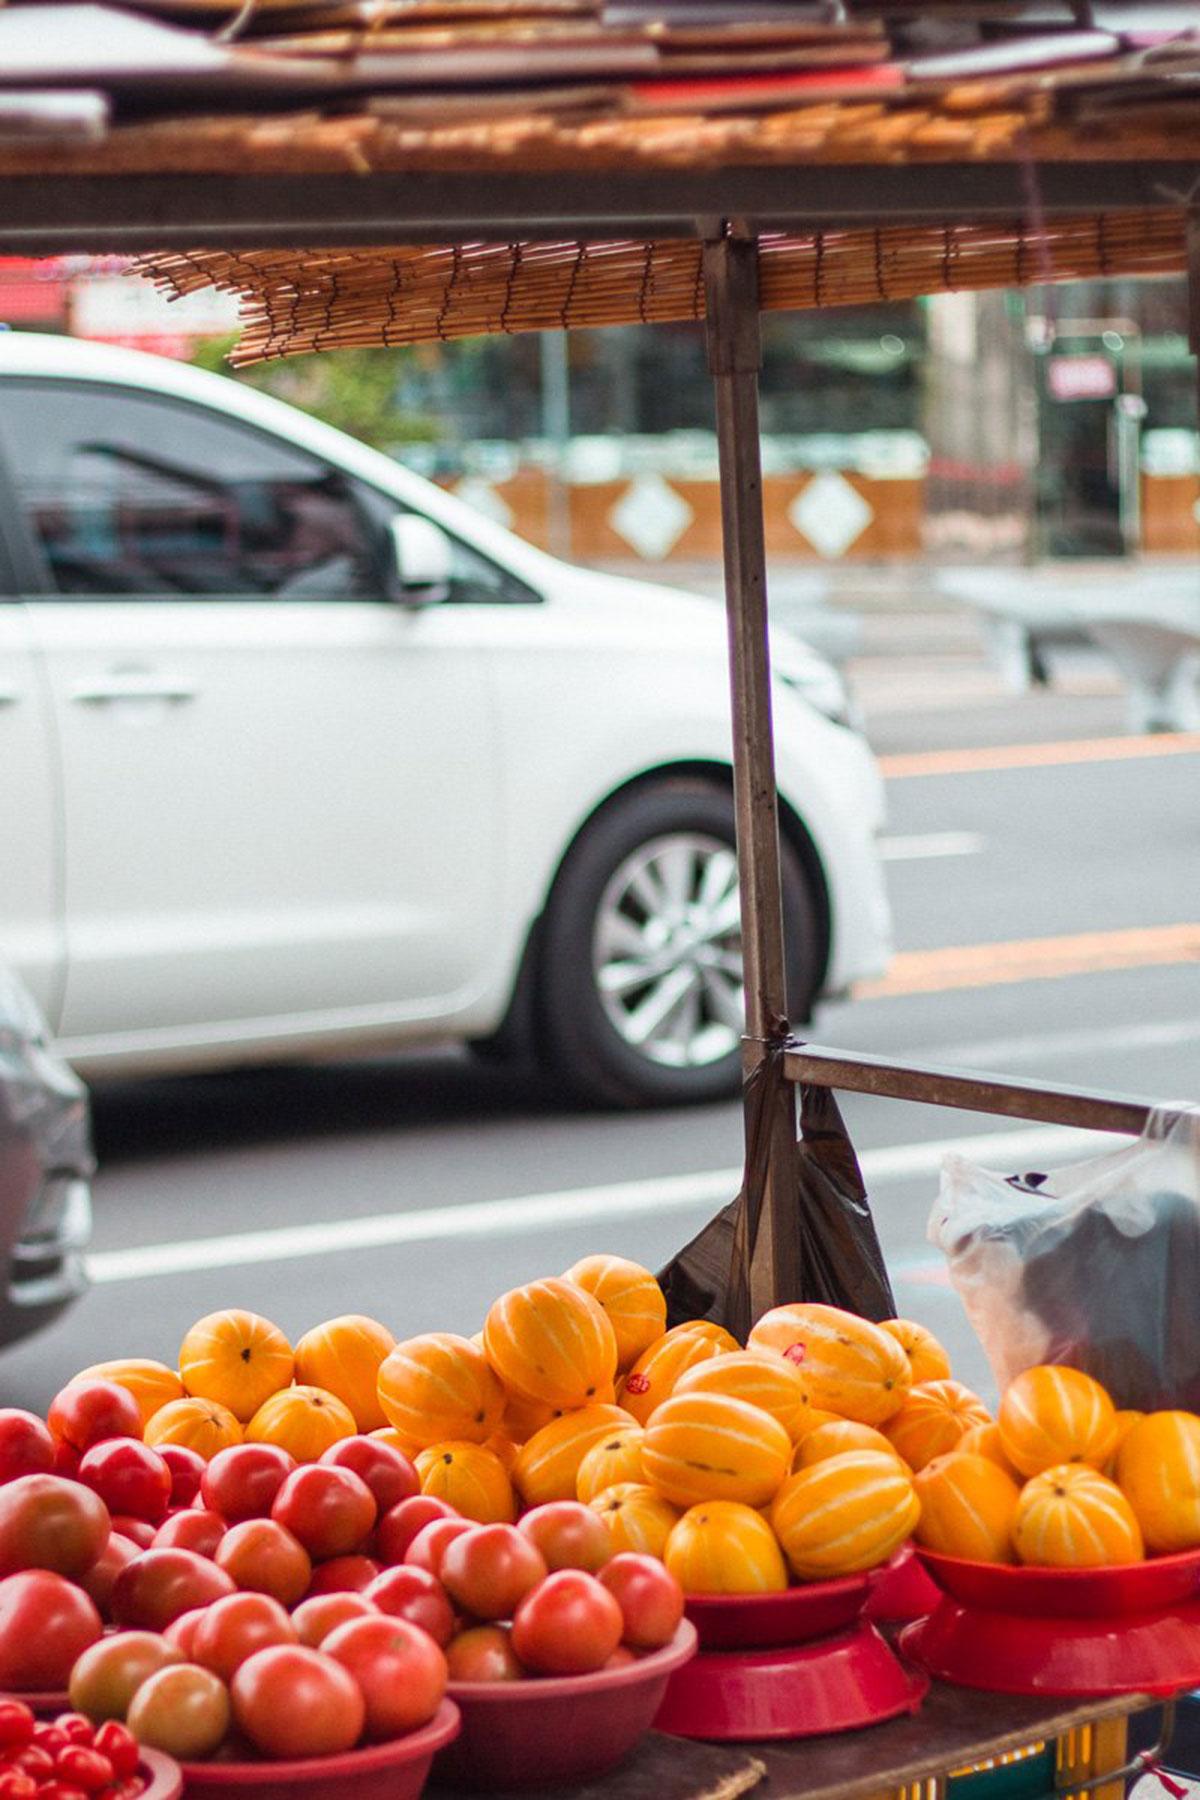 Hallabong fruit stand